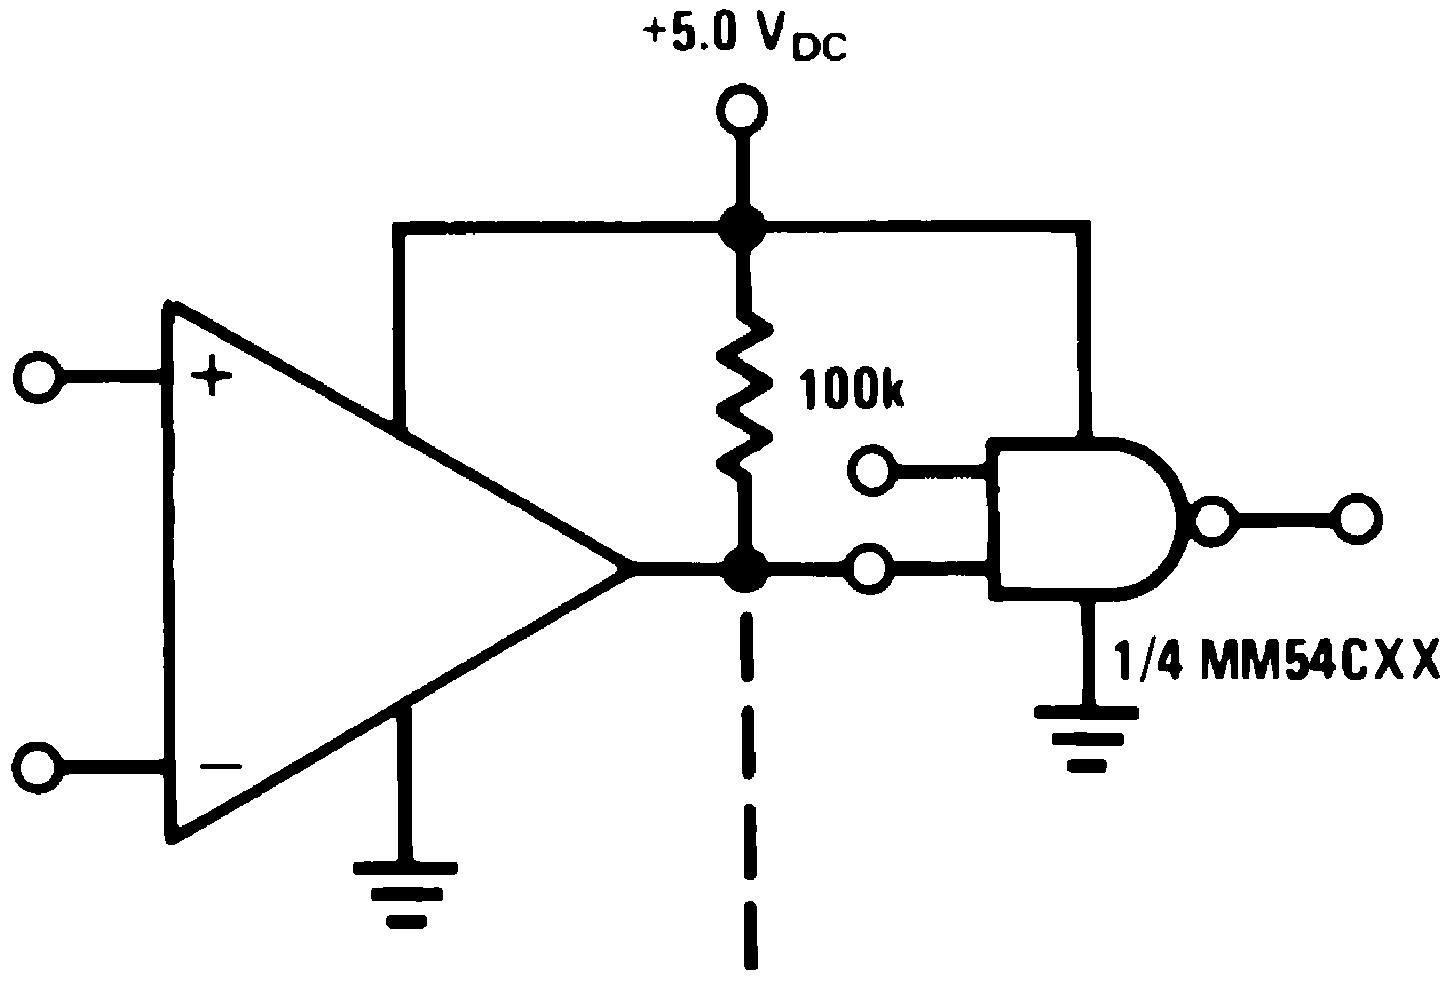 Lmv393 N Adjustabledutycycle Squarewave Oscillator Circuit Diagram Figure 15 Driving Cmos